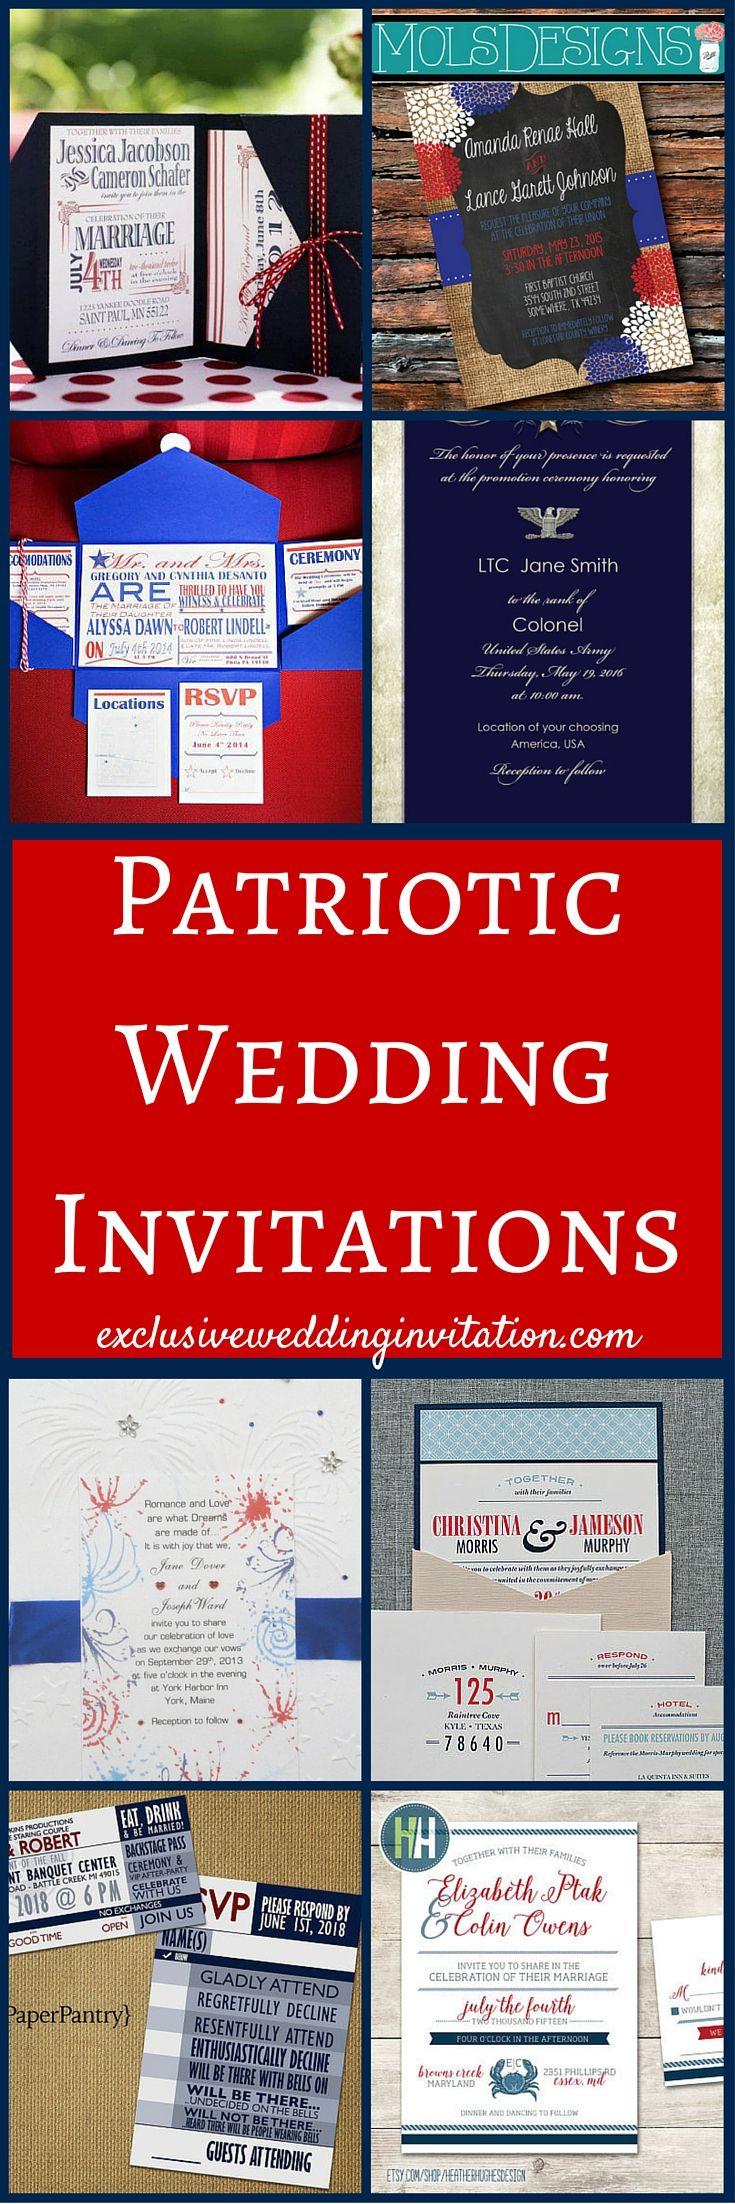 patriotic wedding invitations - Patriotic Wedding Invitations